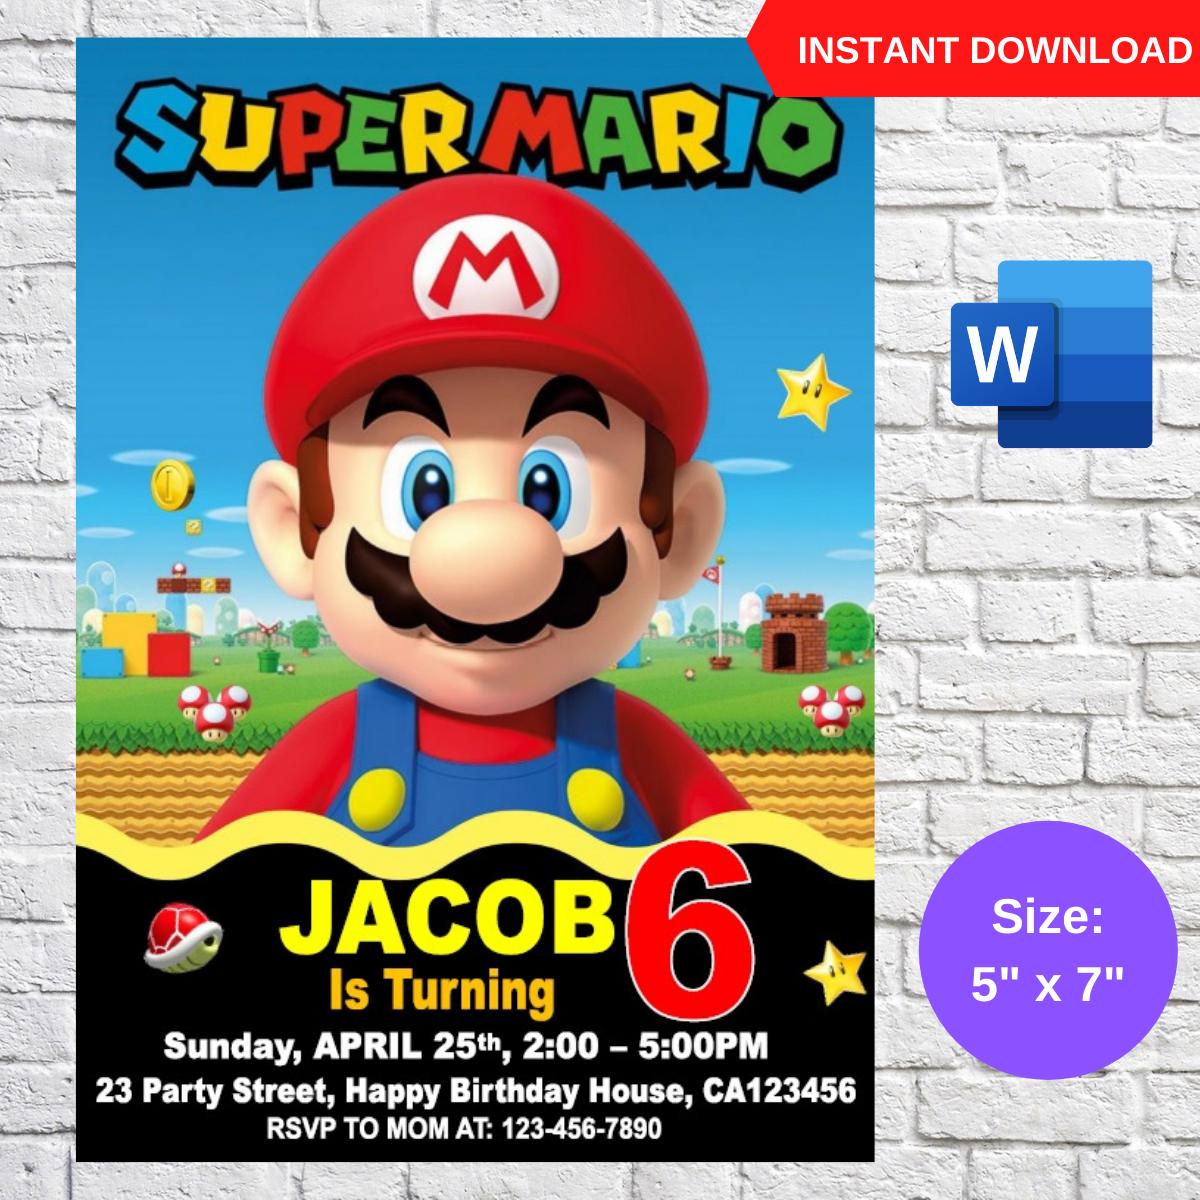 Super Mario Birthday Party Invitation Template